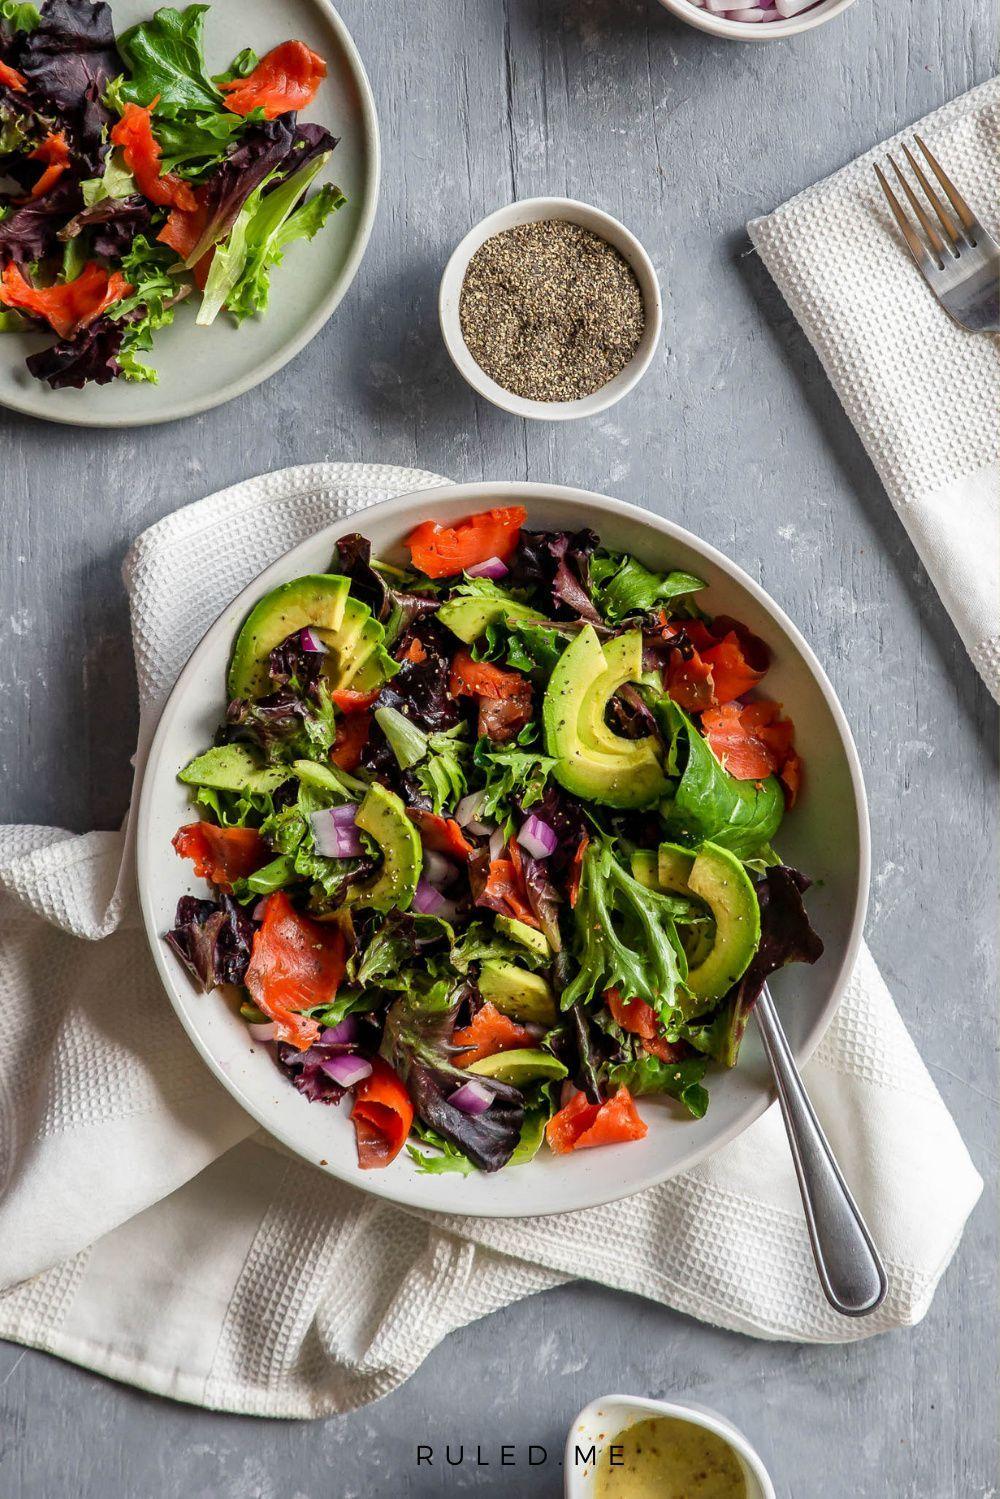 Quick Keto Avocado Salmon Salad Delicious Keto Friendly Recipe In 2021 Salmon Salad Salmon Salad Recipes Salmon Avocado [ 1499 x 1000 Pixel ]